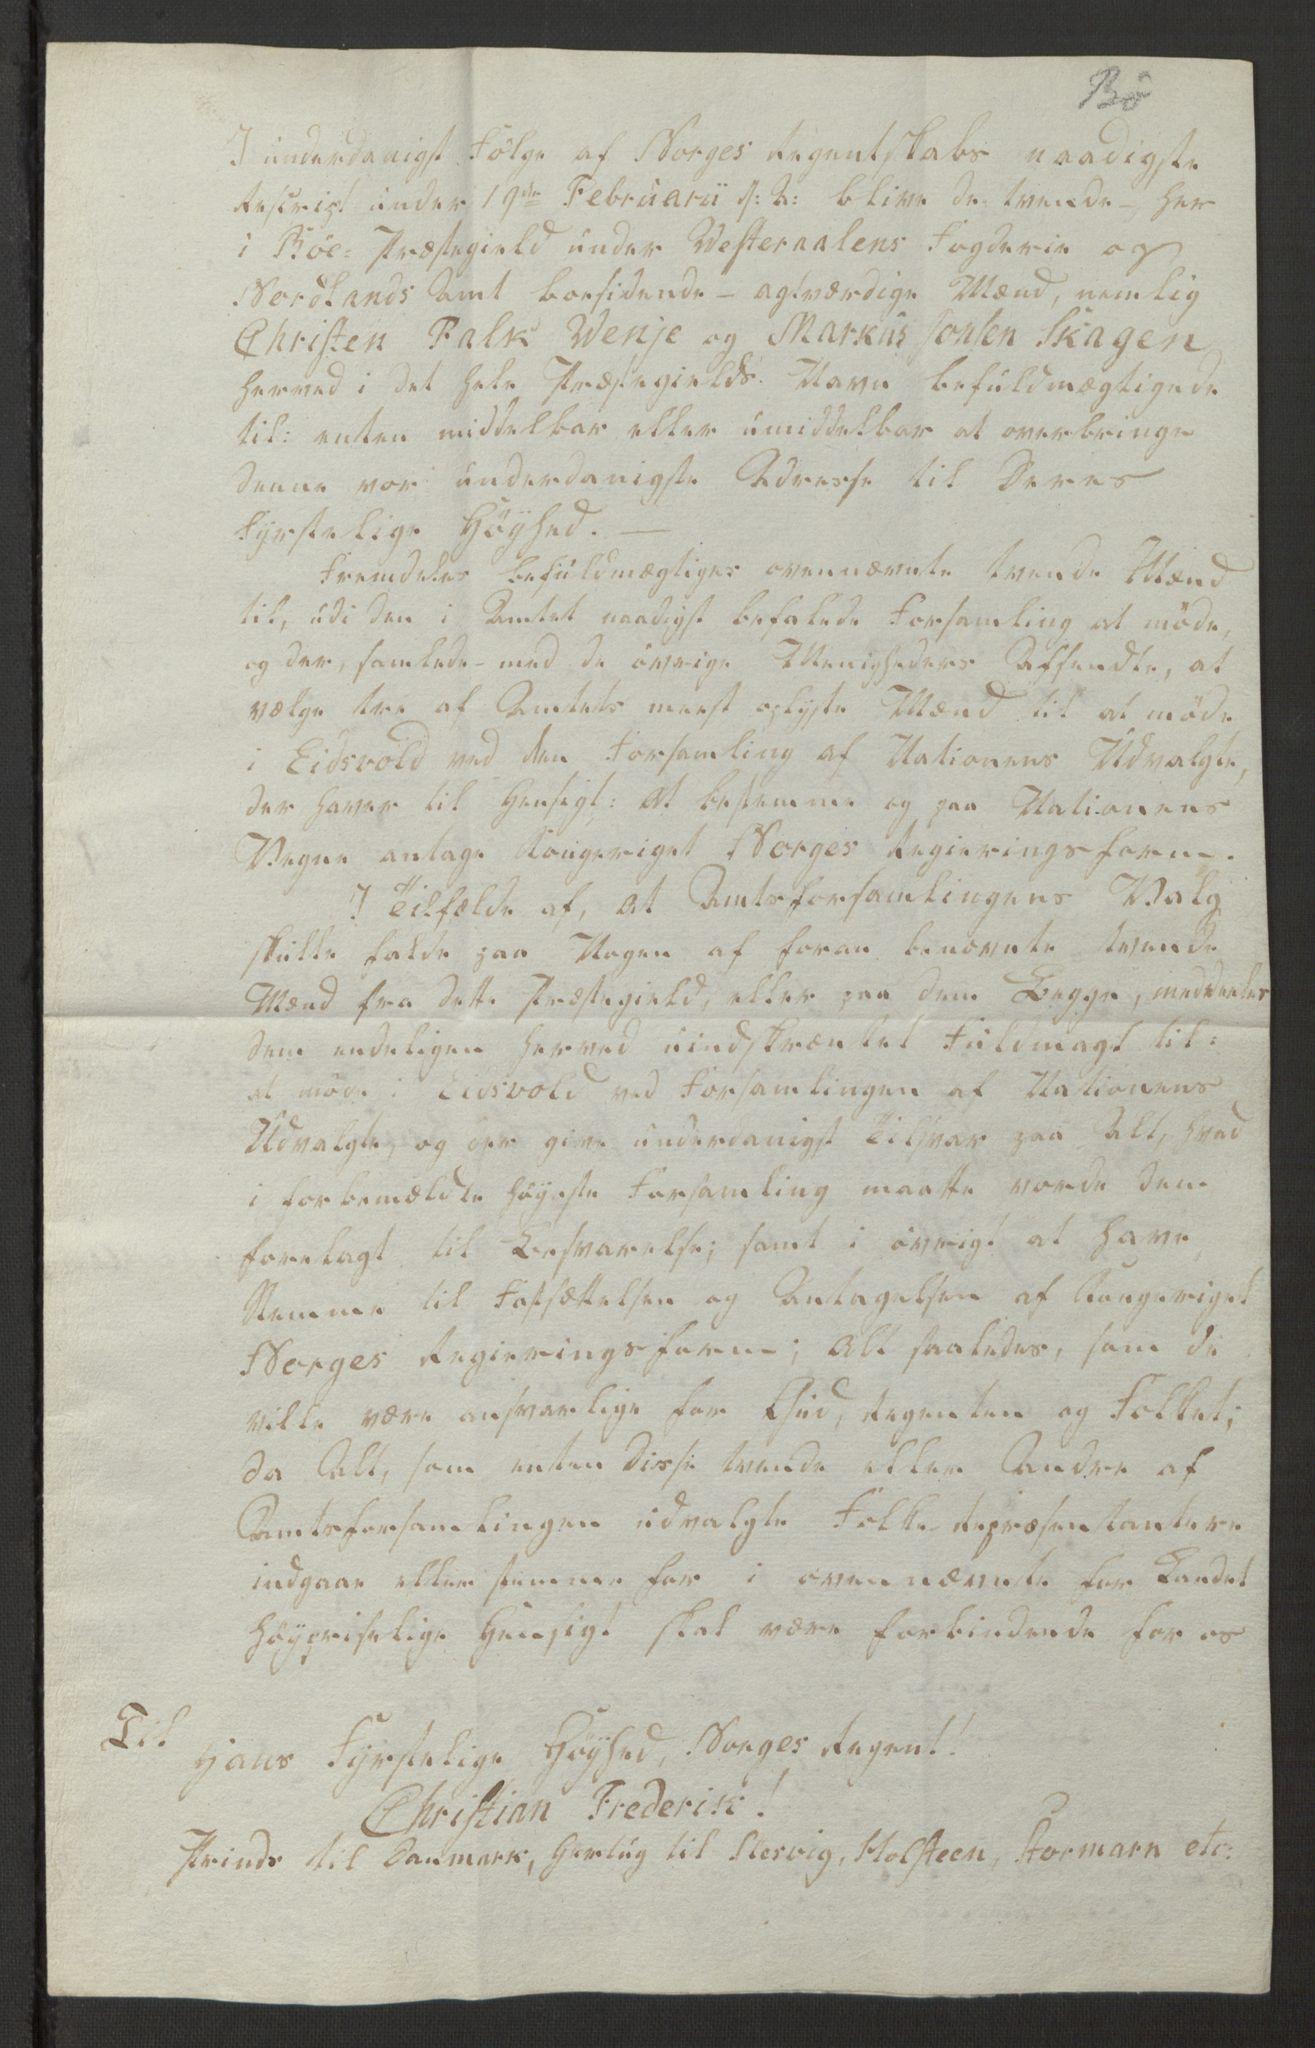 SAT, Nordland amt/fylke*, 1814, s. 23